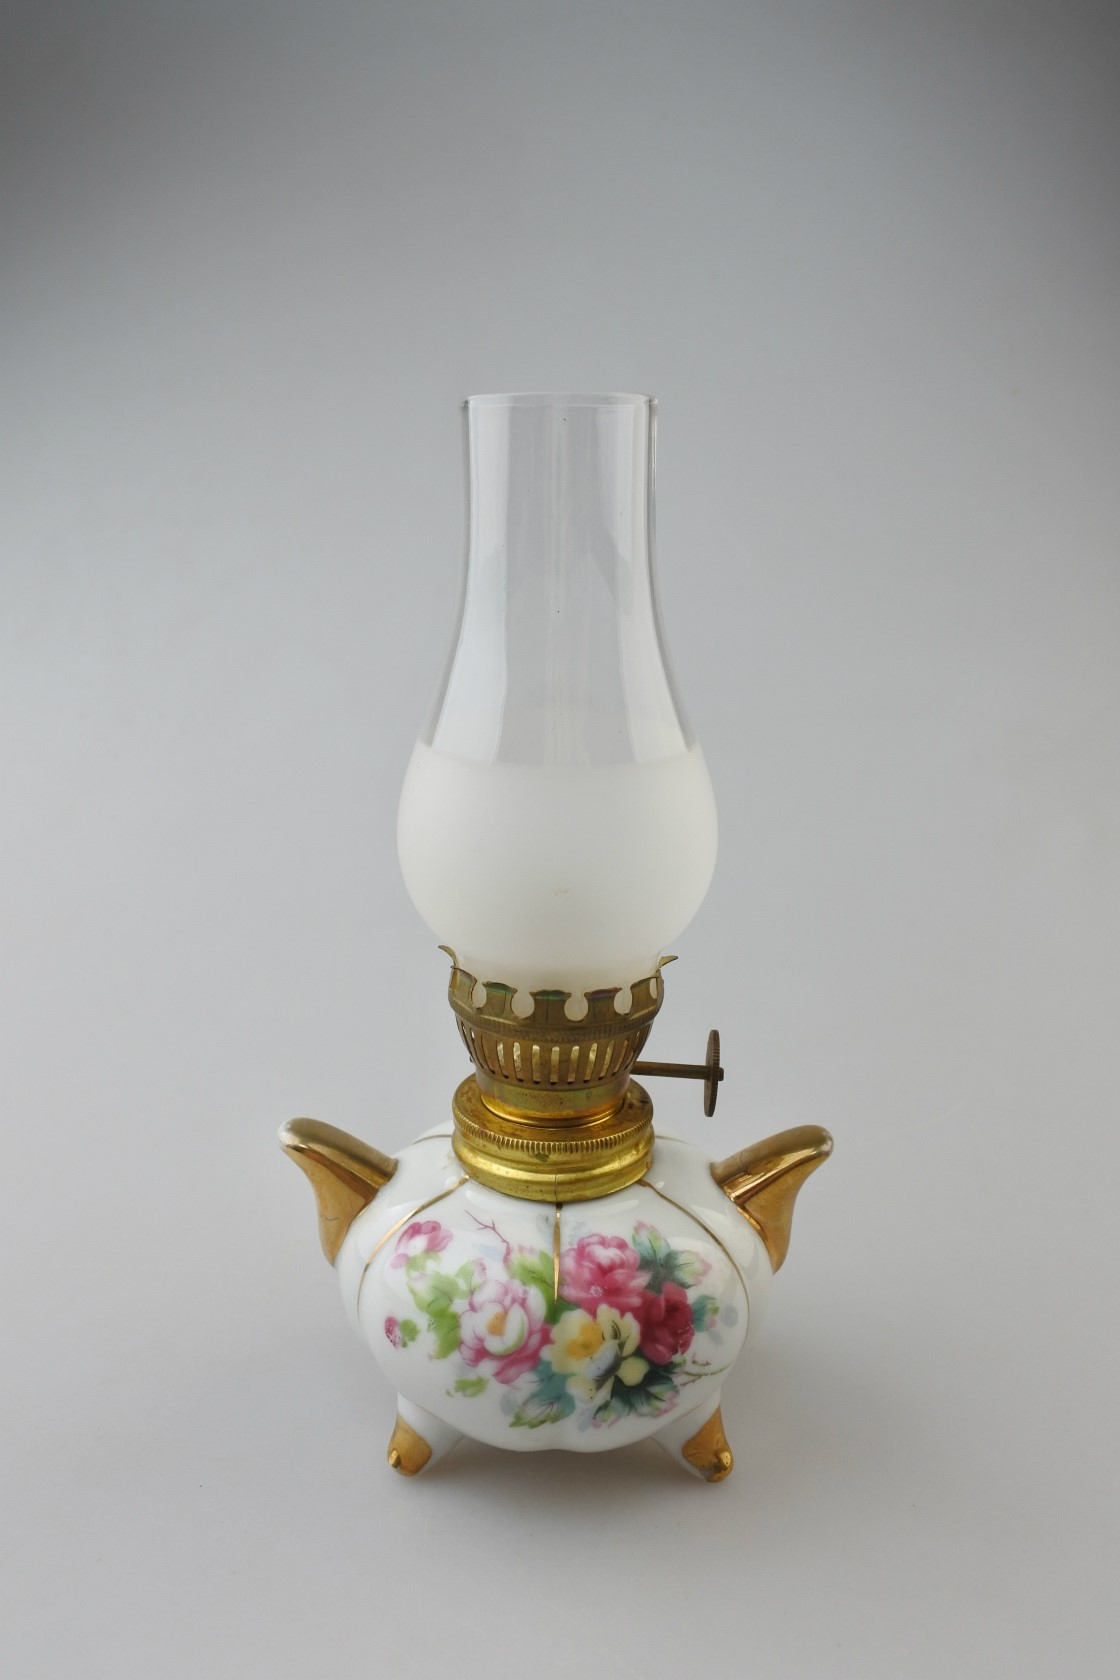 vi-arnartcreations-lamp